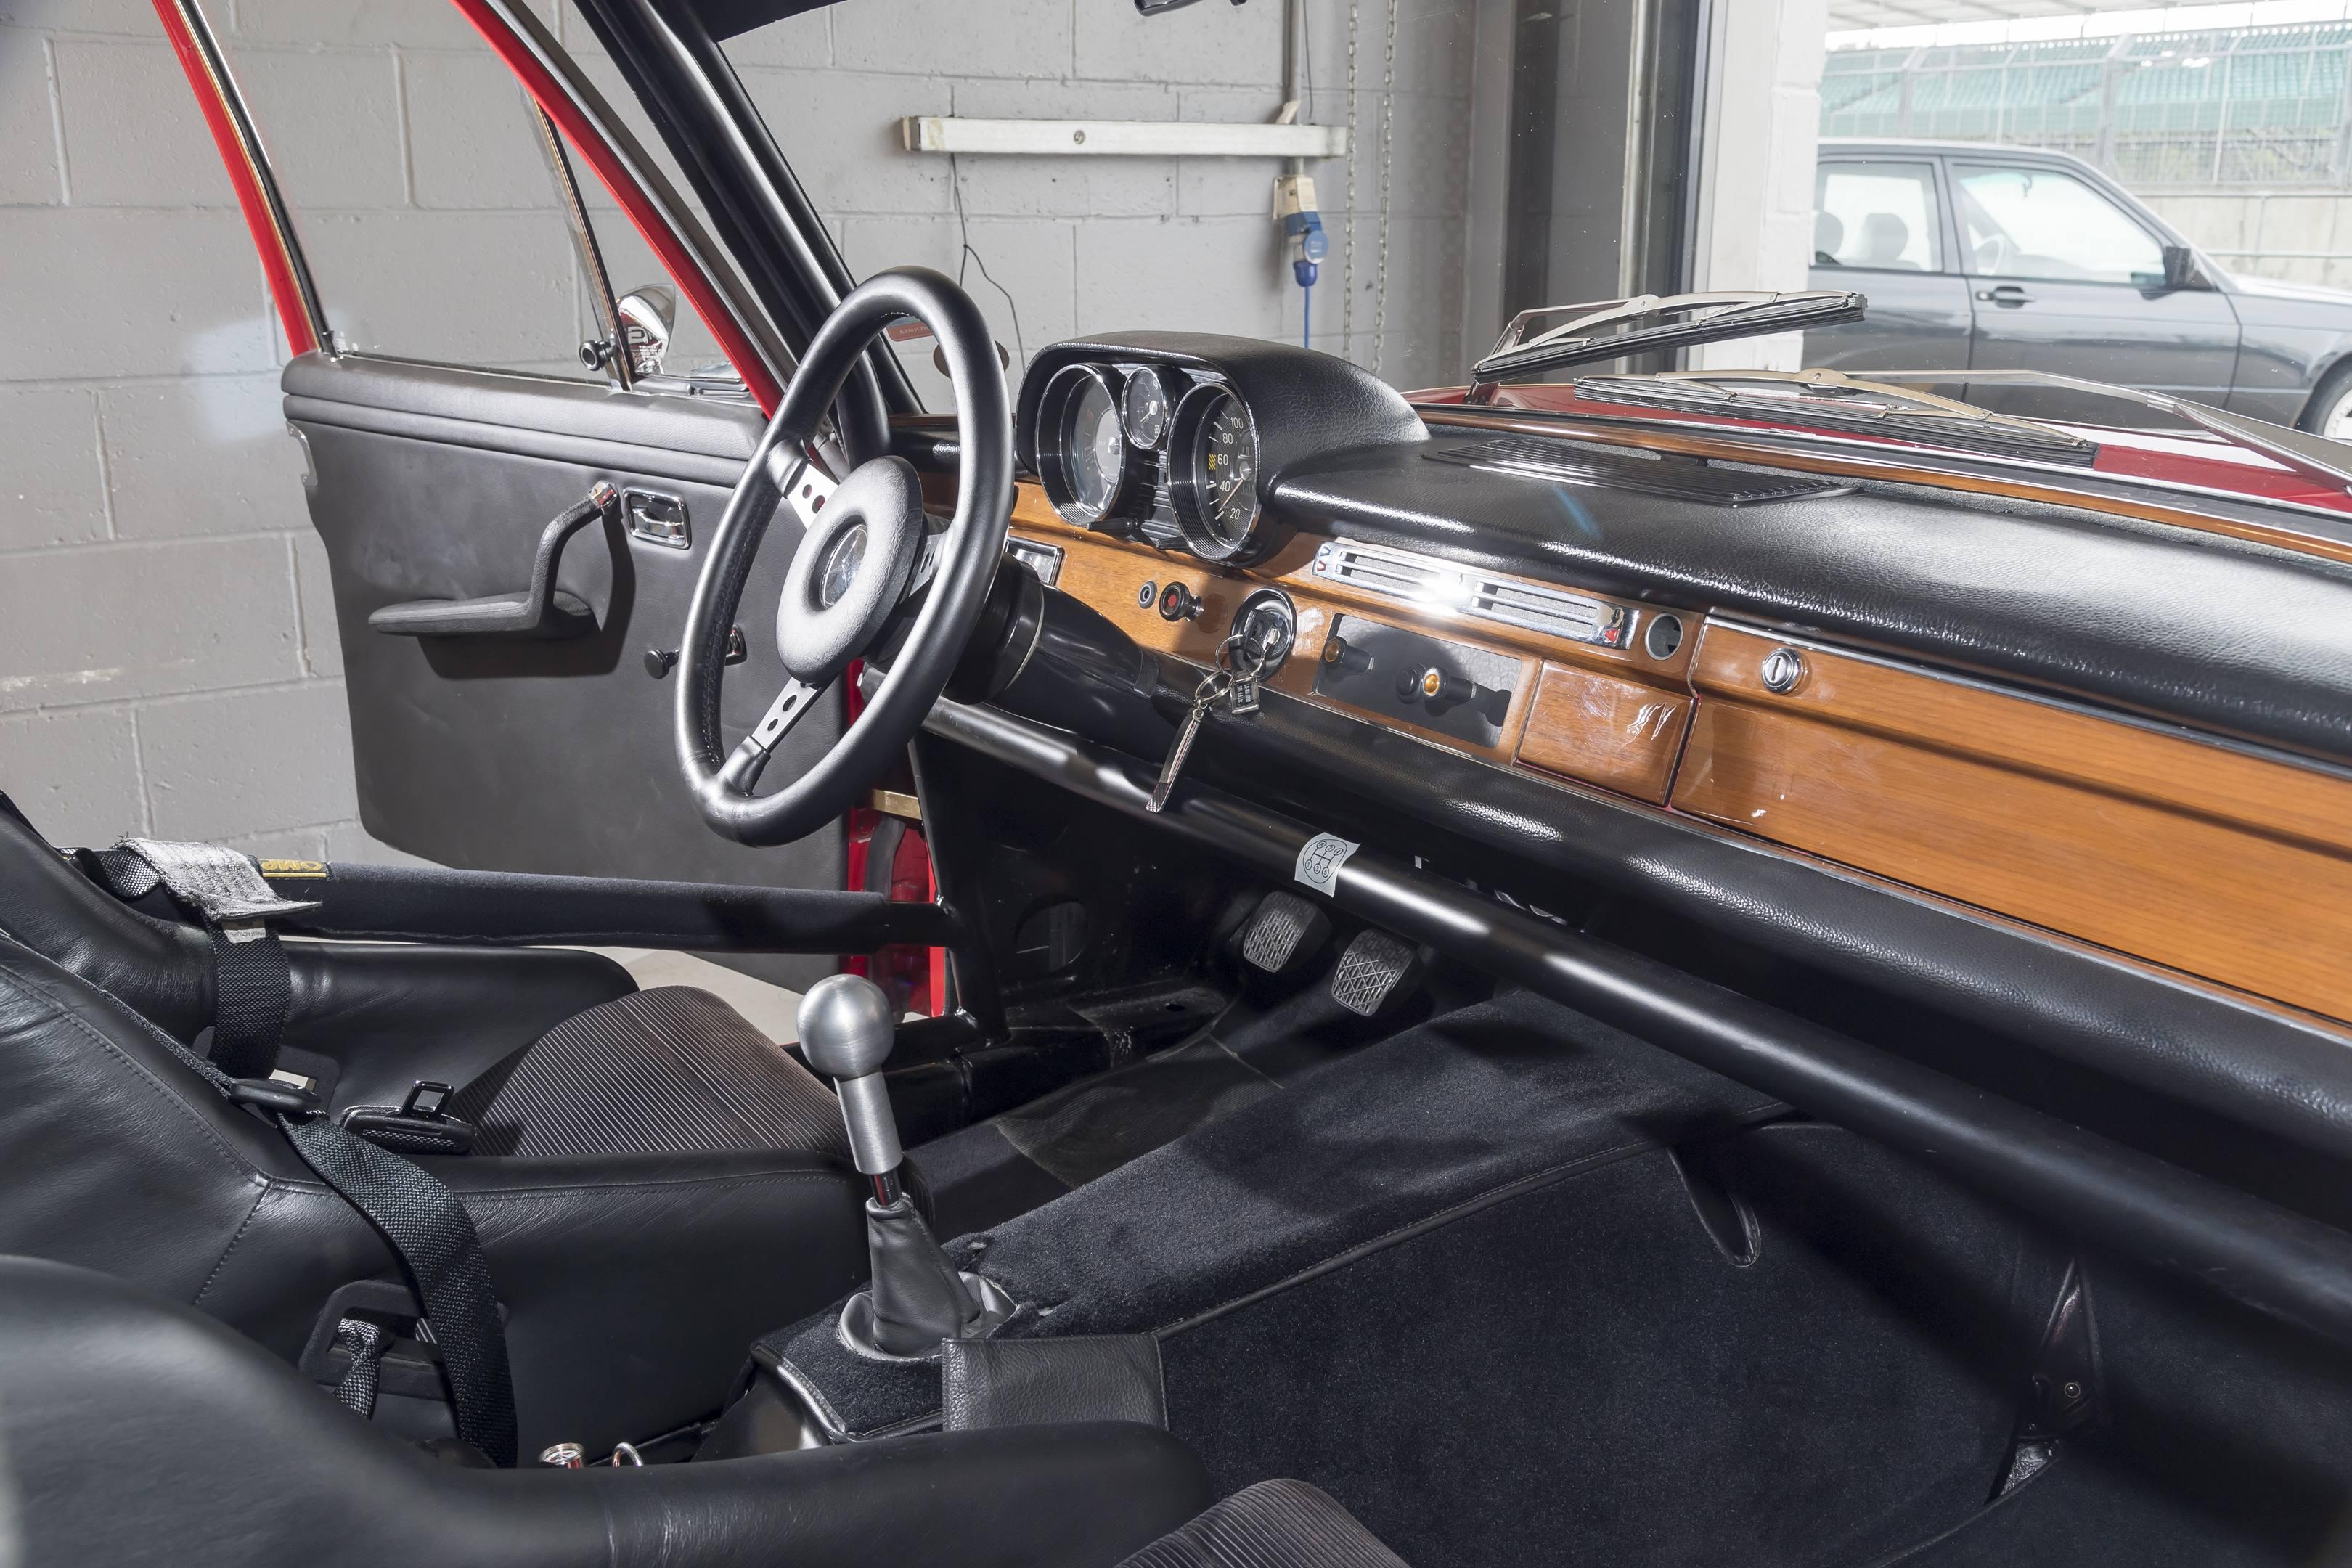 mercedes benz amg 300SEL 6.3 interior wood trim race